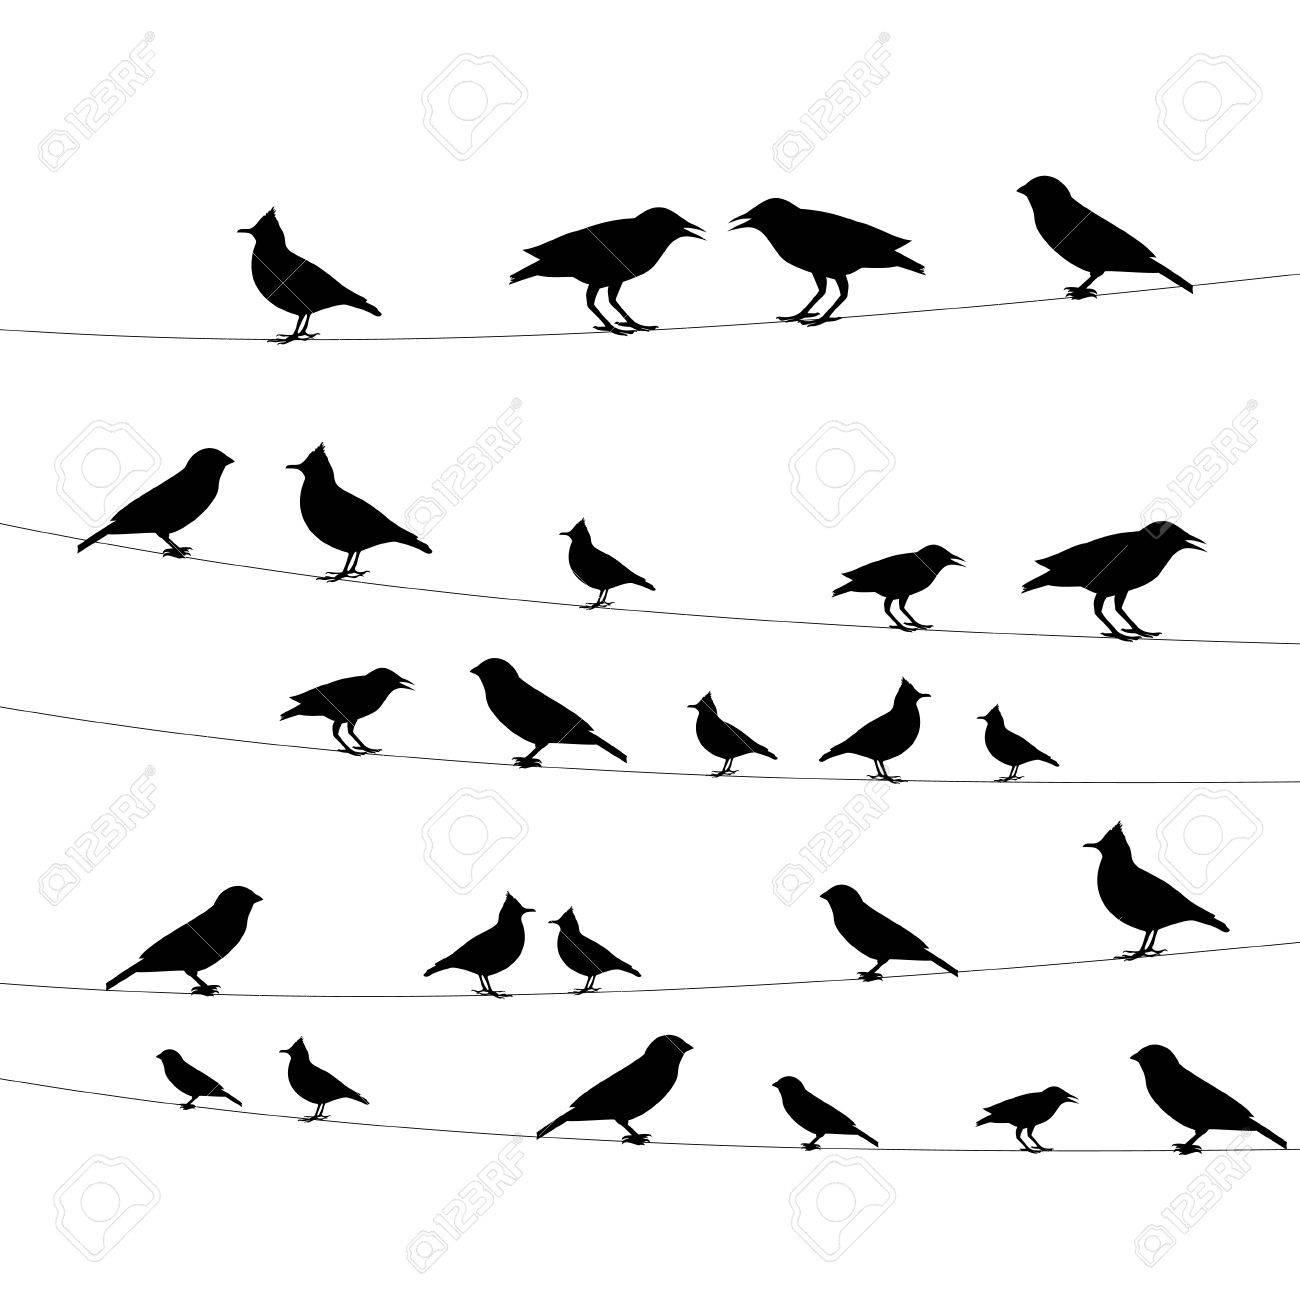 Vögel Auf Einem Draht-Symbol, Vektor-Illustration Lizenzfrei ...